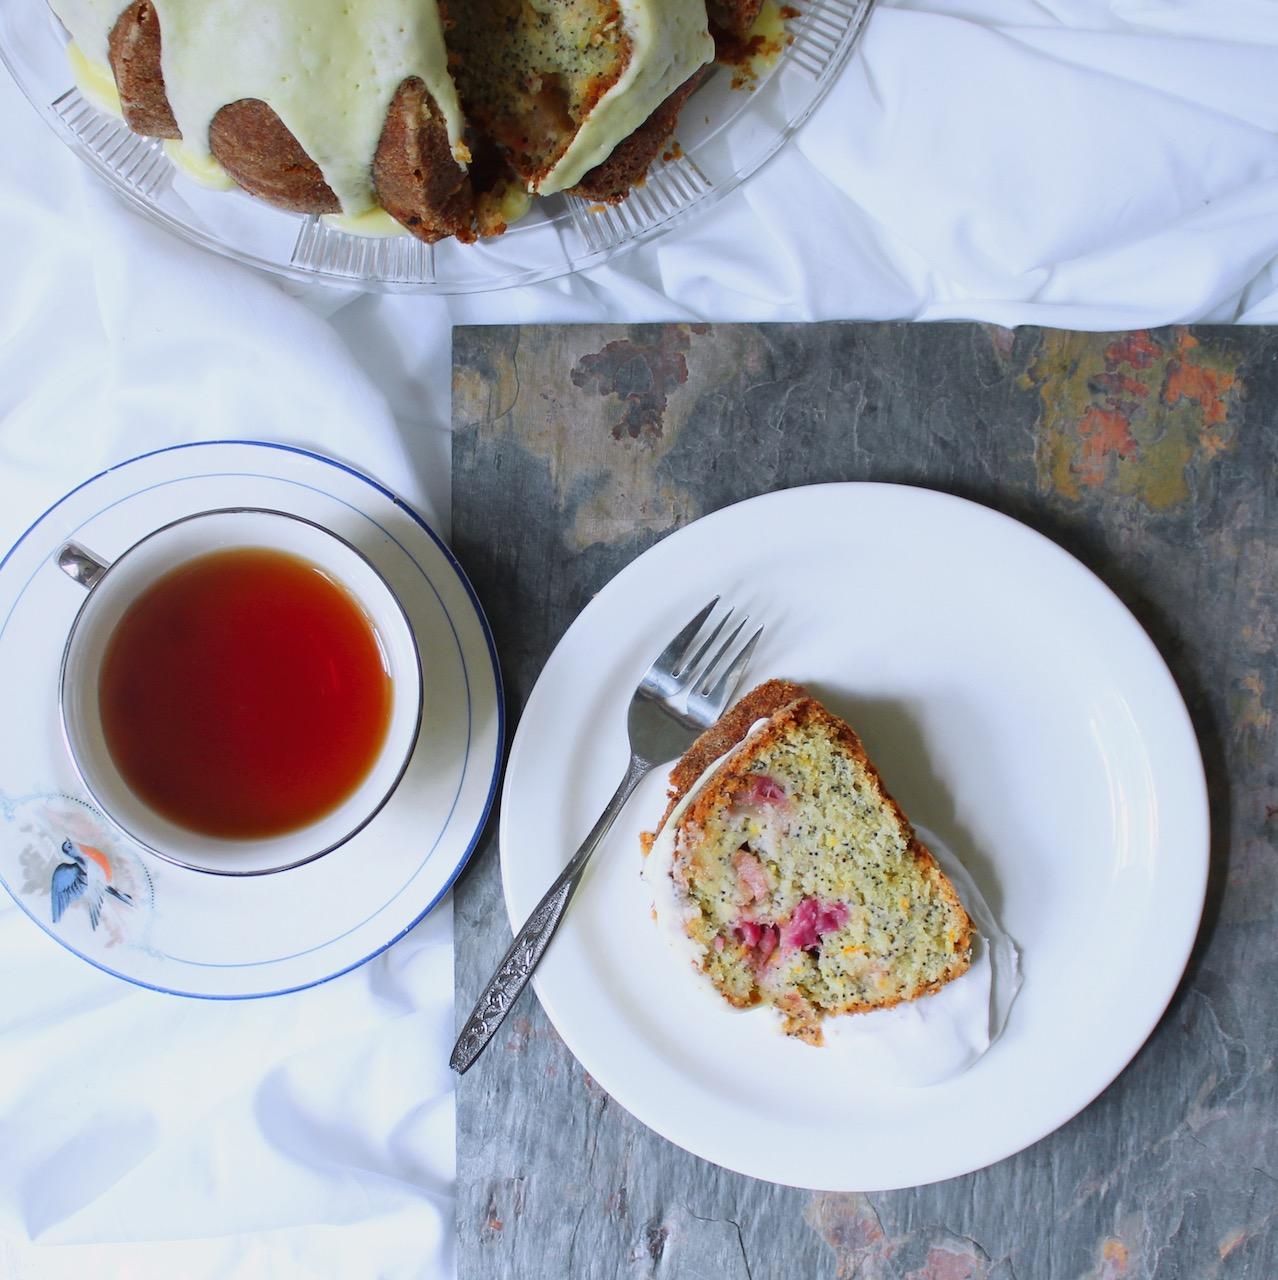 rhubarb poppyseed cake with cup of tea